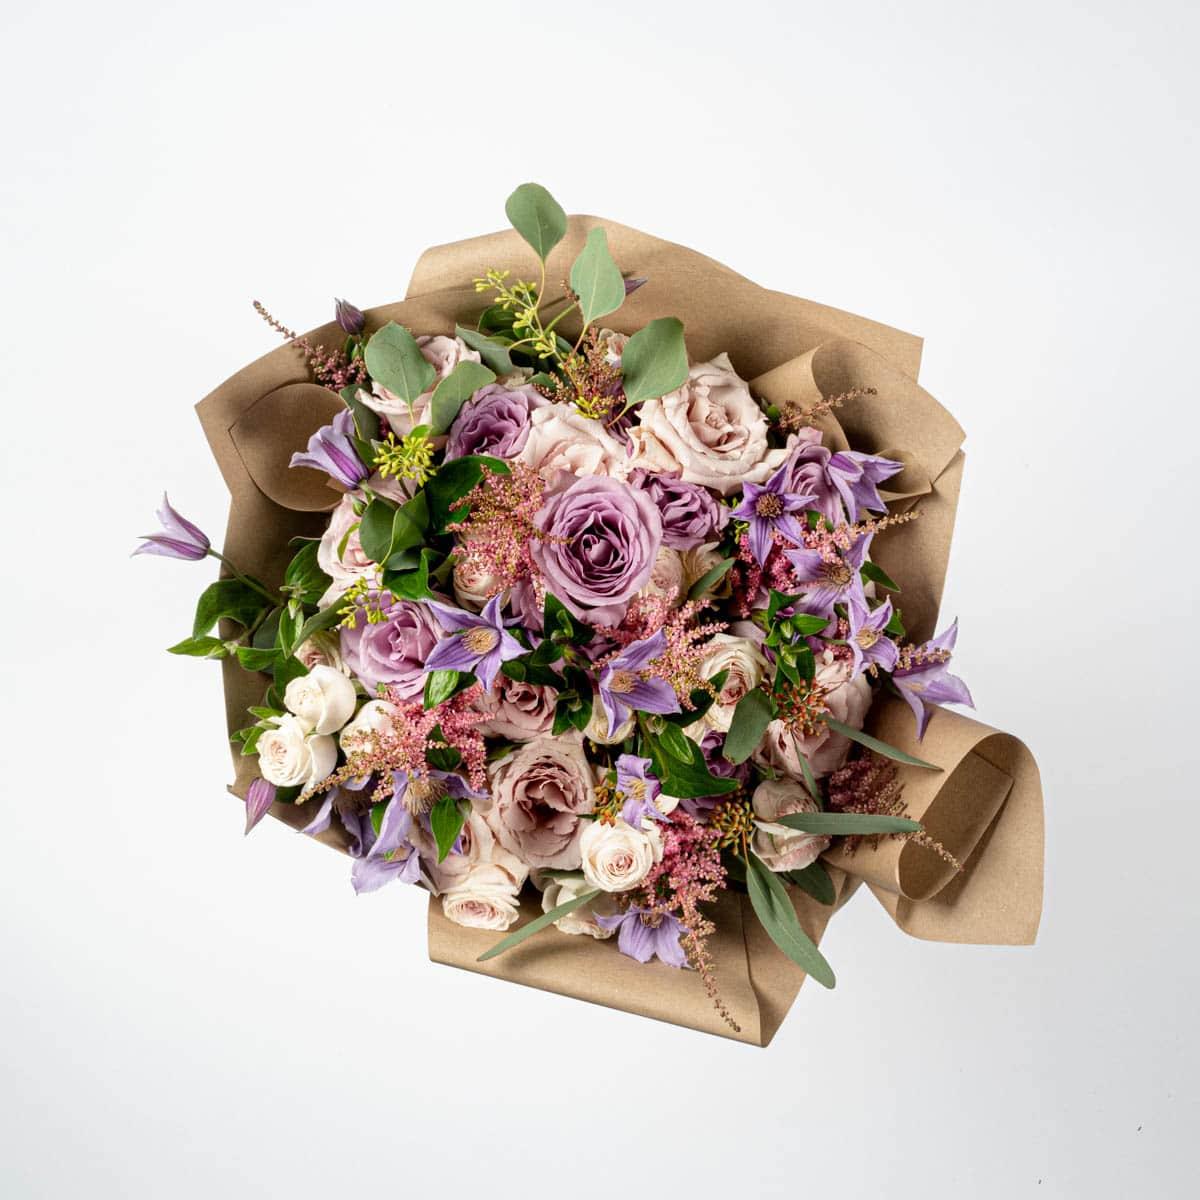 Bloom Flower Delivery | Vintage Dreams Bouquet